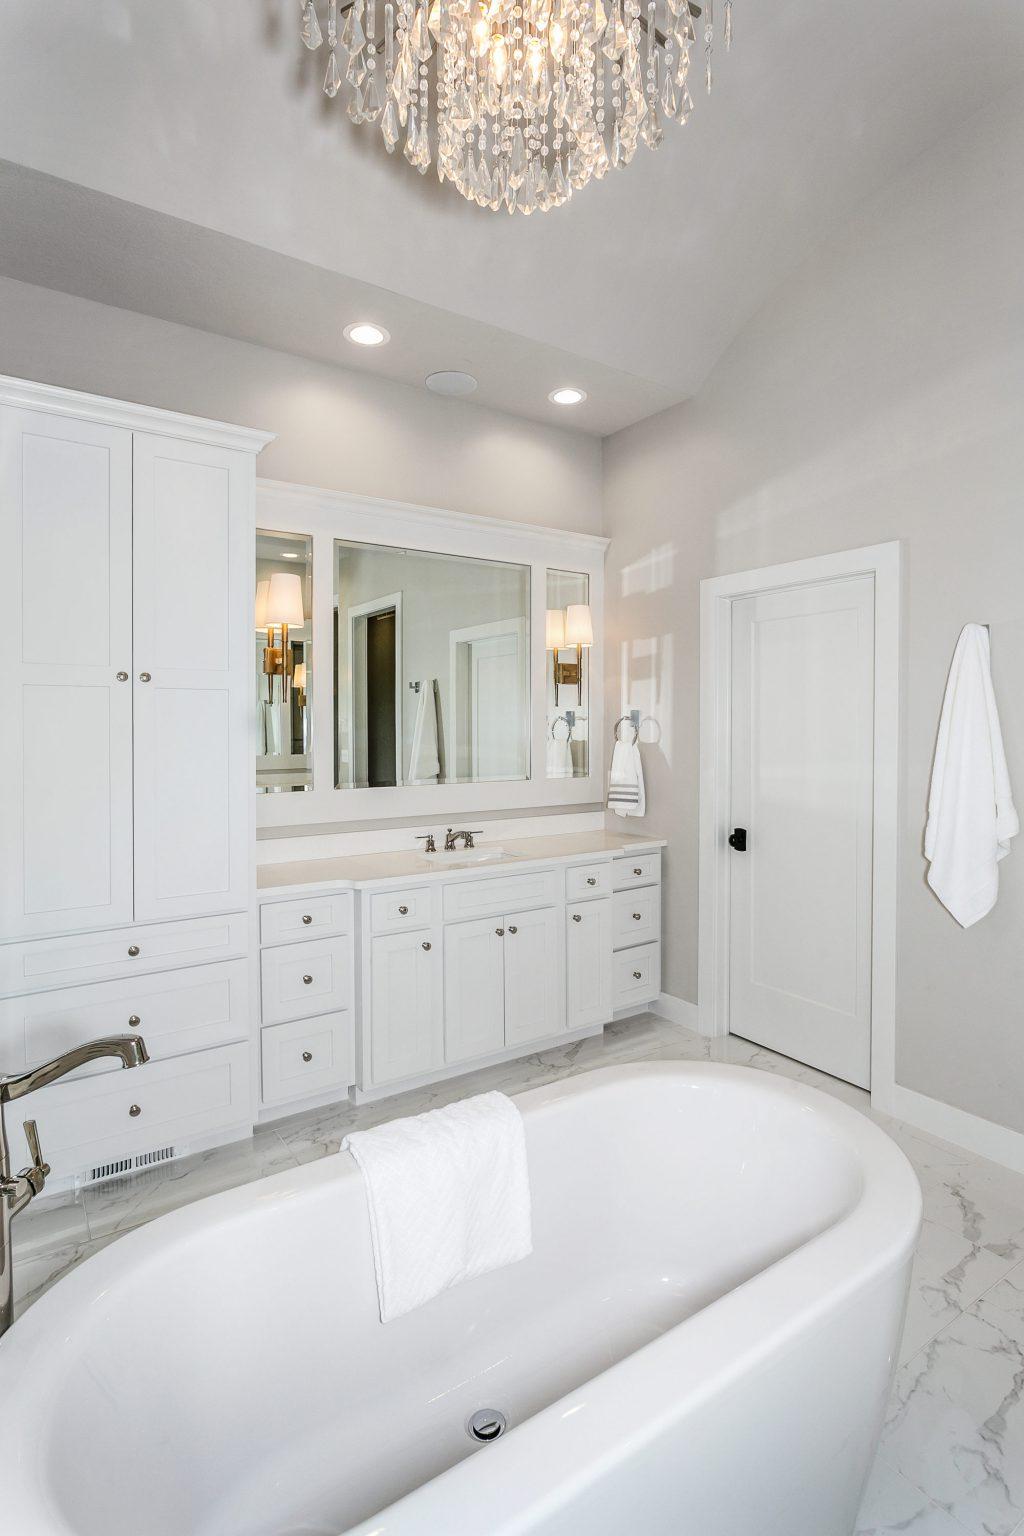 Magnolia Floor Plan Master Bathroom Vanity 1 and Tub